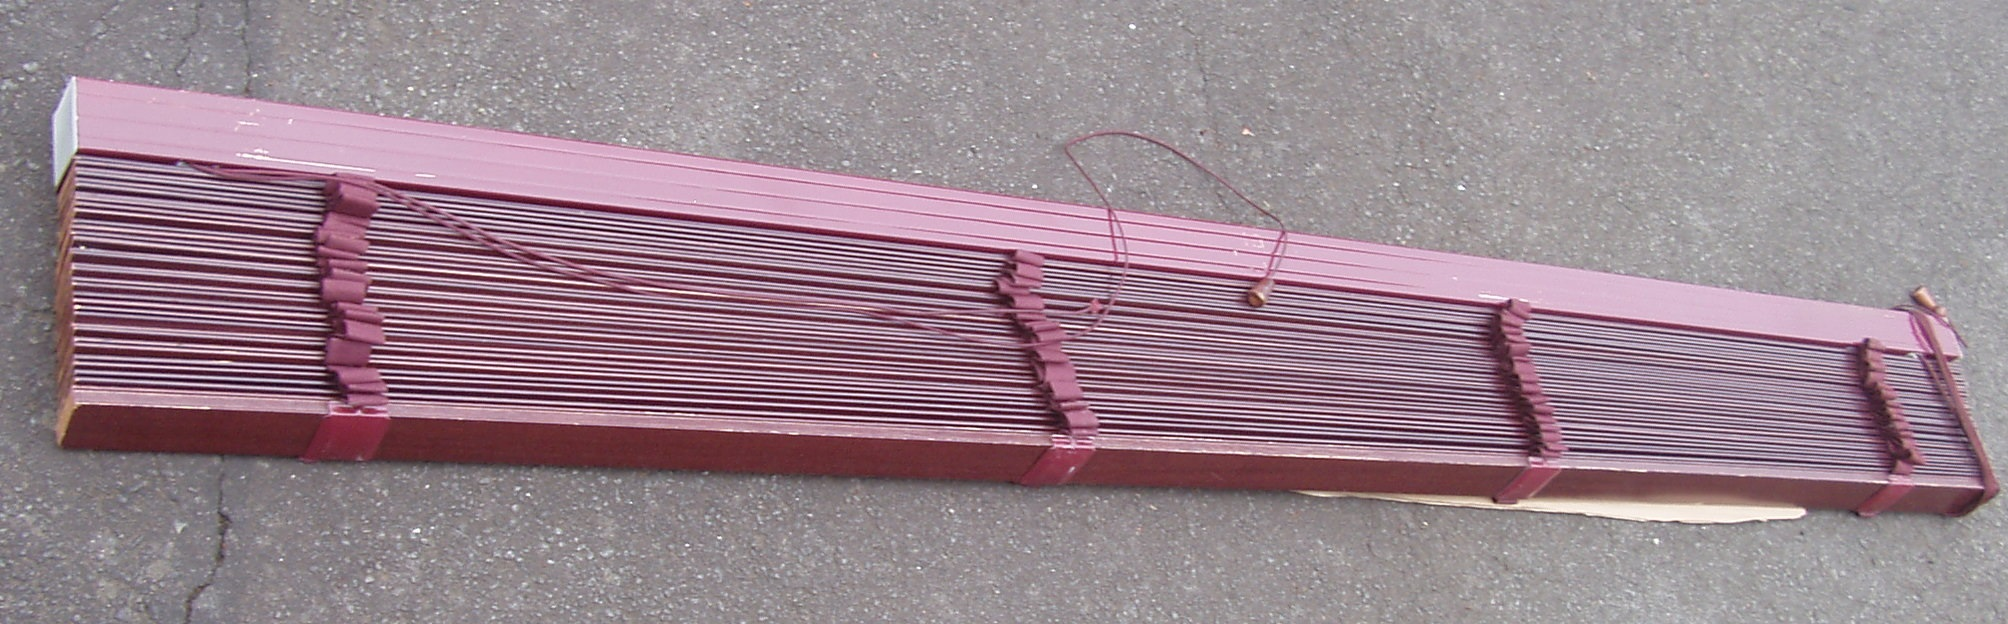 Venetian Wood Blinds - 50mm